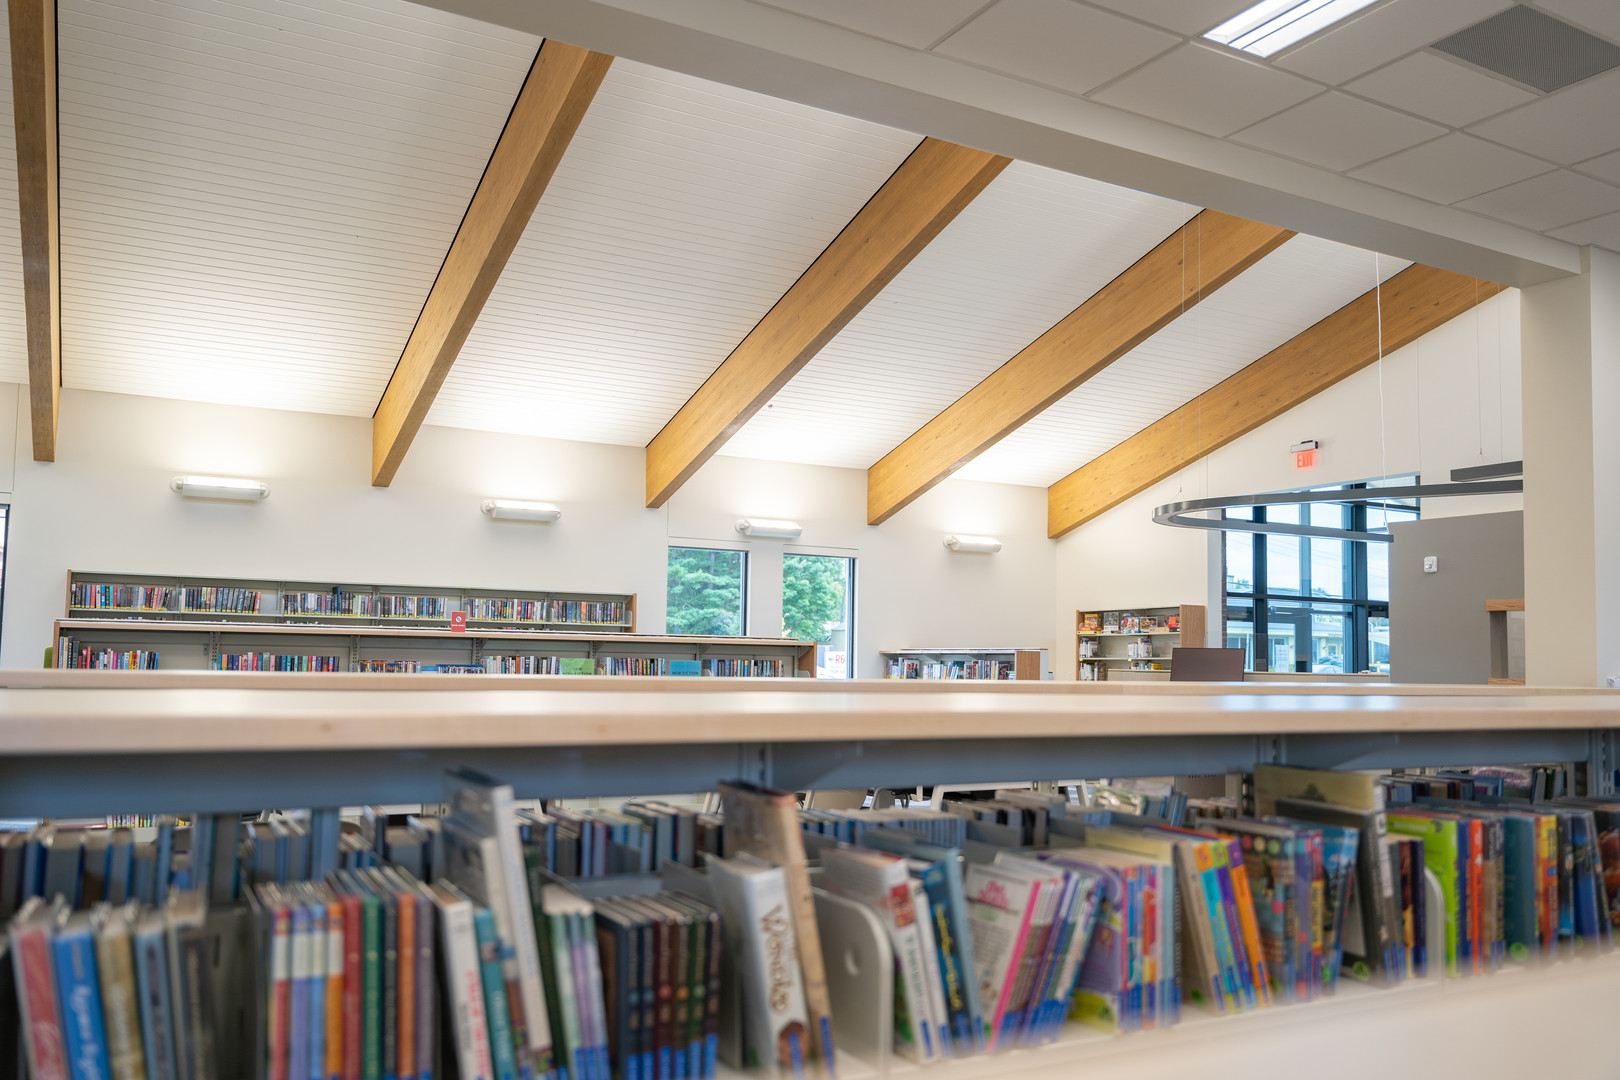 Saugatuck-Douglas Library(13).jpg